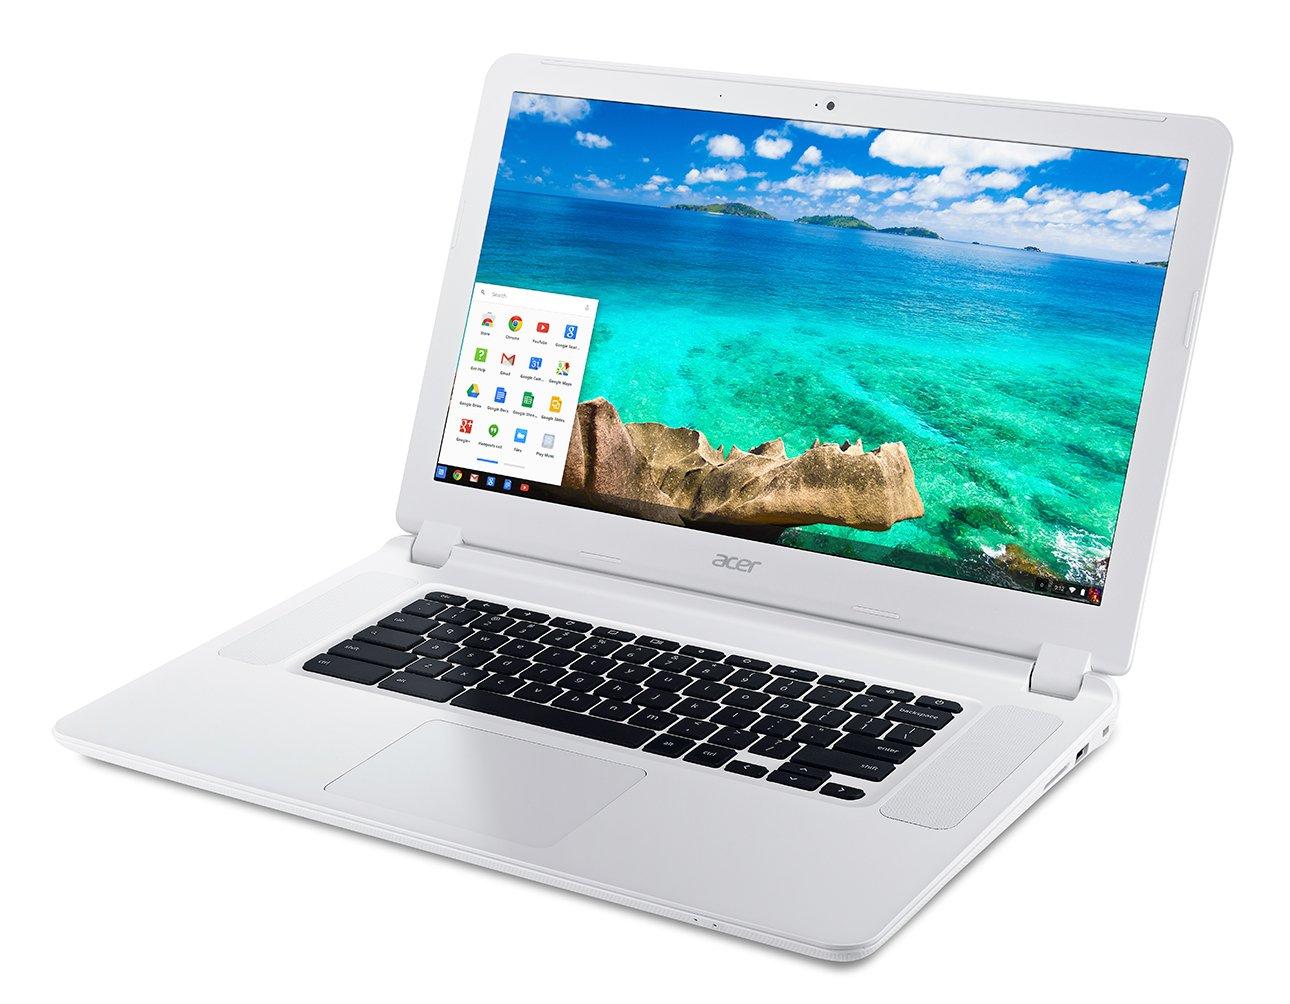 Acer Chromebook 15 CB5-571-C09S (15 6-Inch Full HD IPS, 4GB RAM, 32GB SSD)